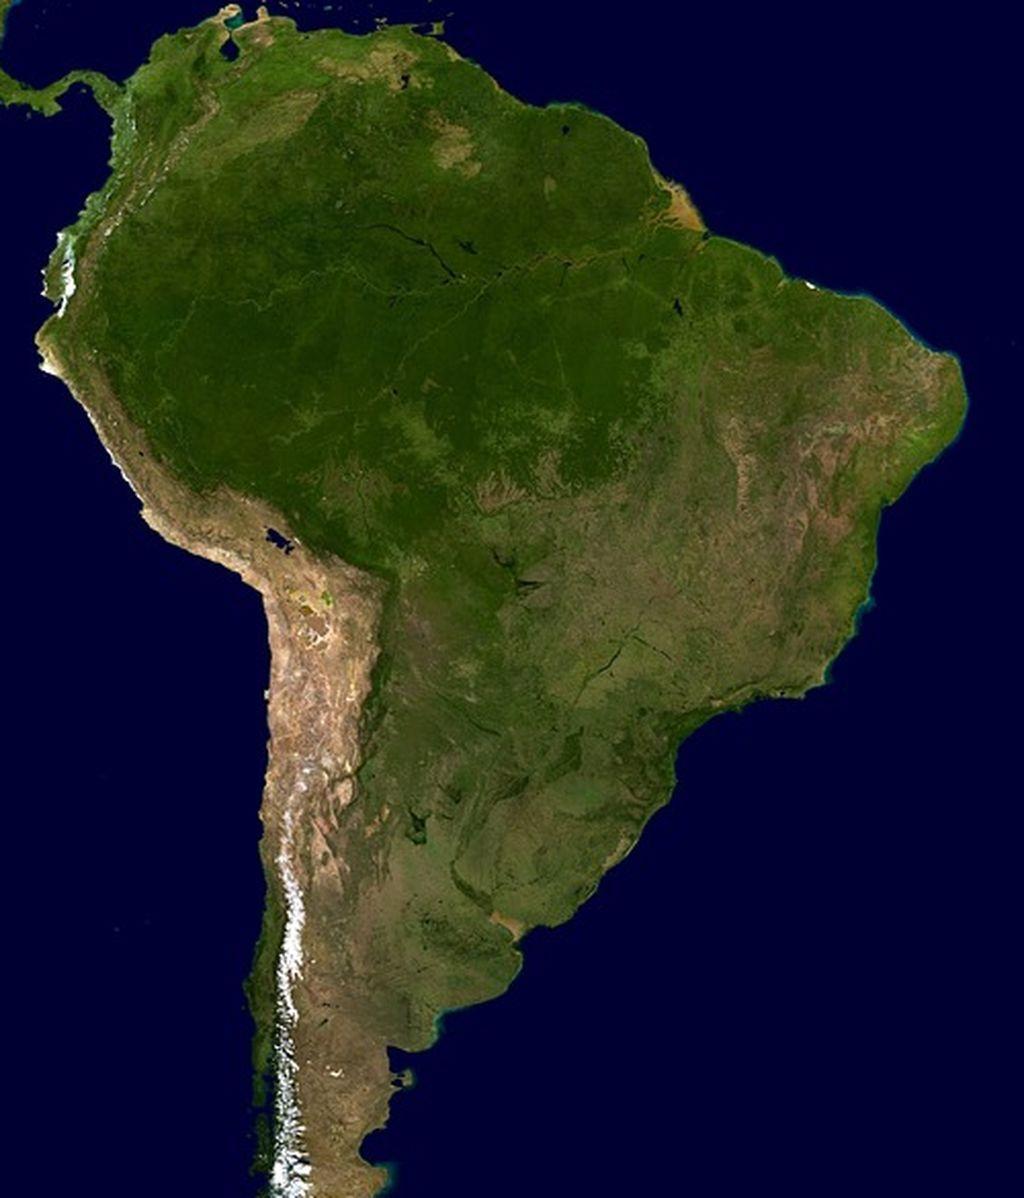 south-america-74073_960_720